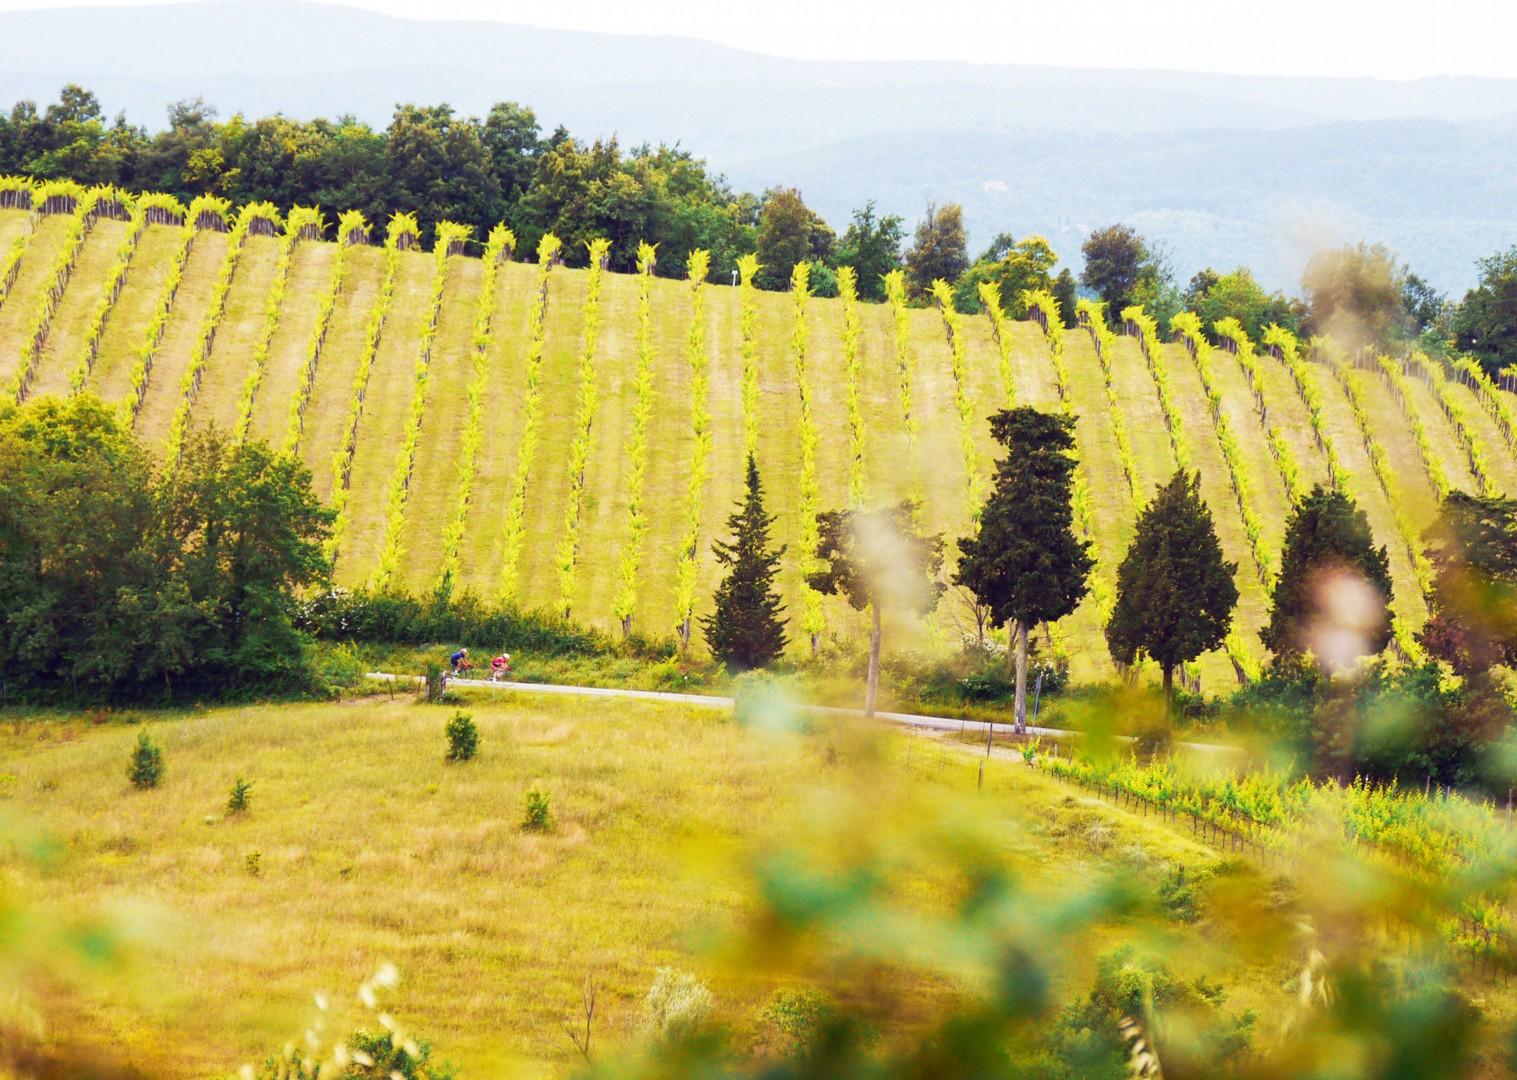 vineyards-road-cycling-italy-tuscany.jpg - Italy - Tuscany Tourer - Self Guided Road Cycling Holiday - Road Cycling